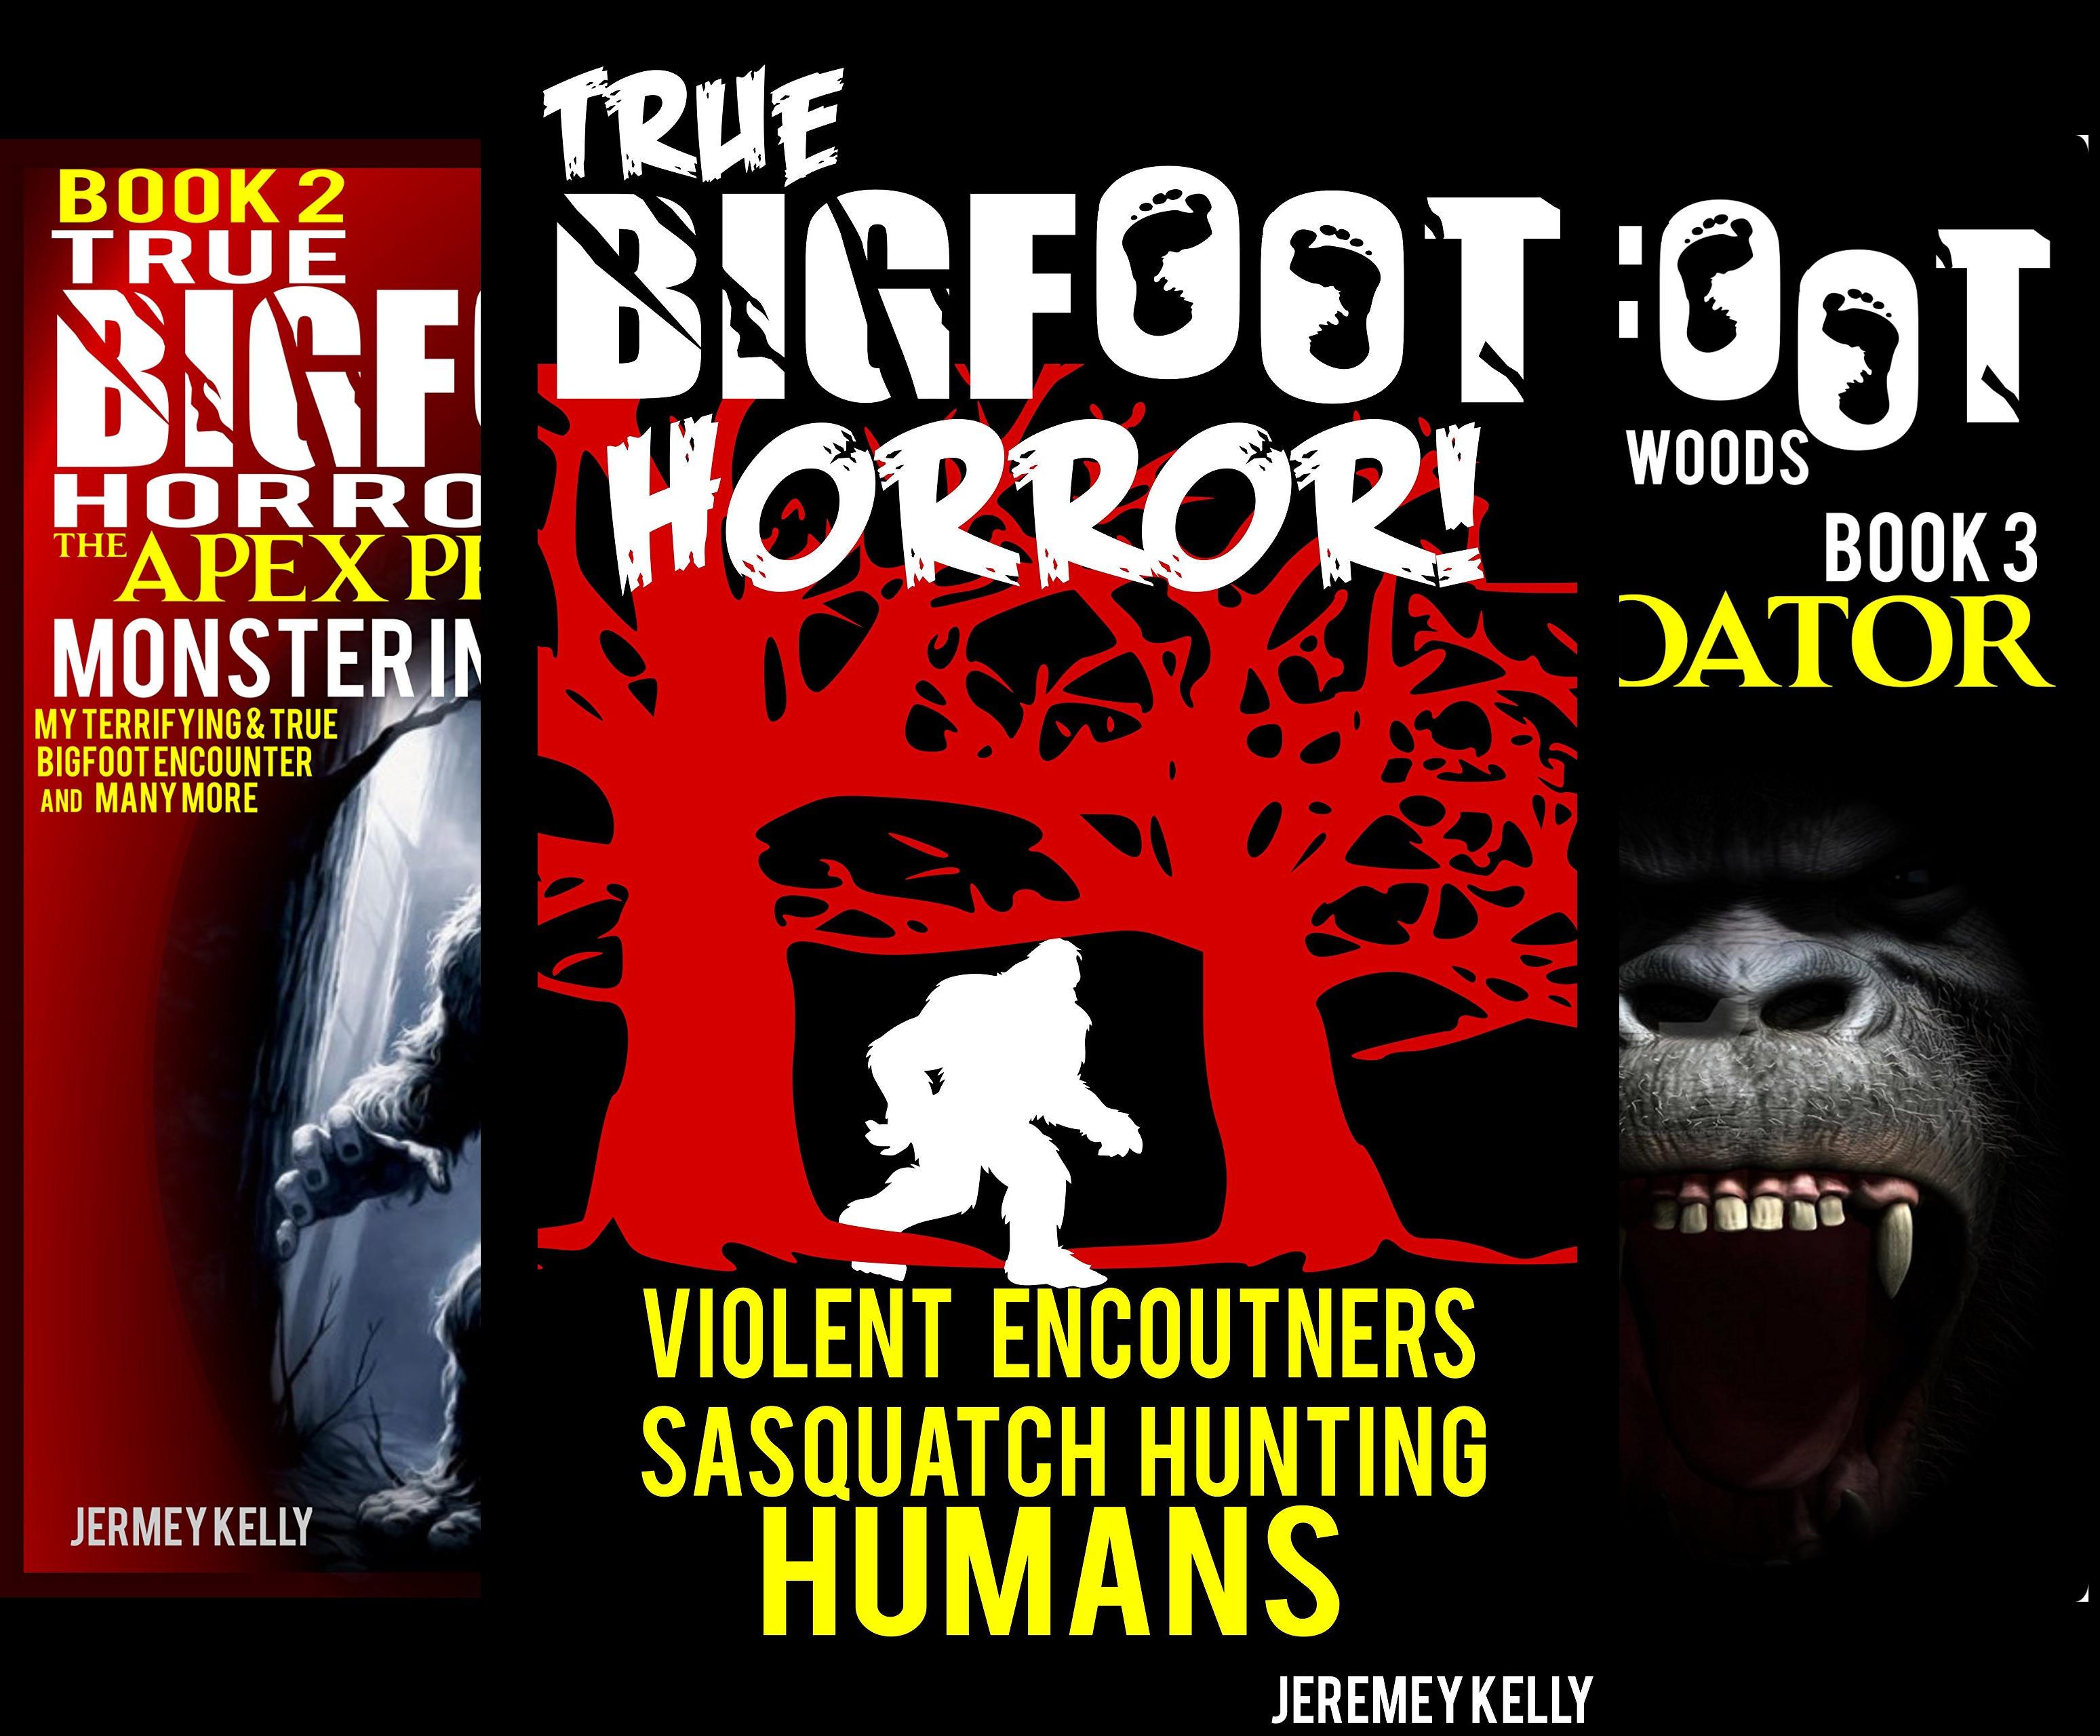 True Bigfoot Horror (4 Book Series)